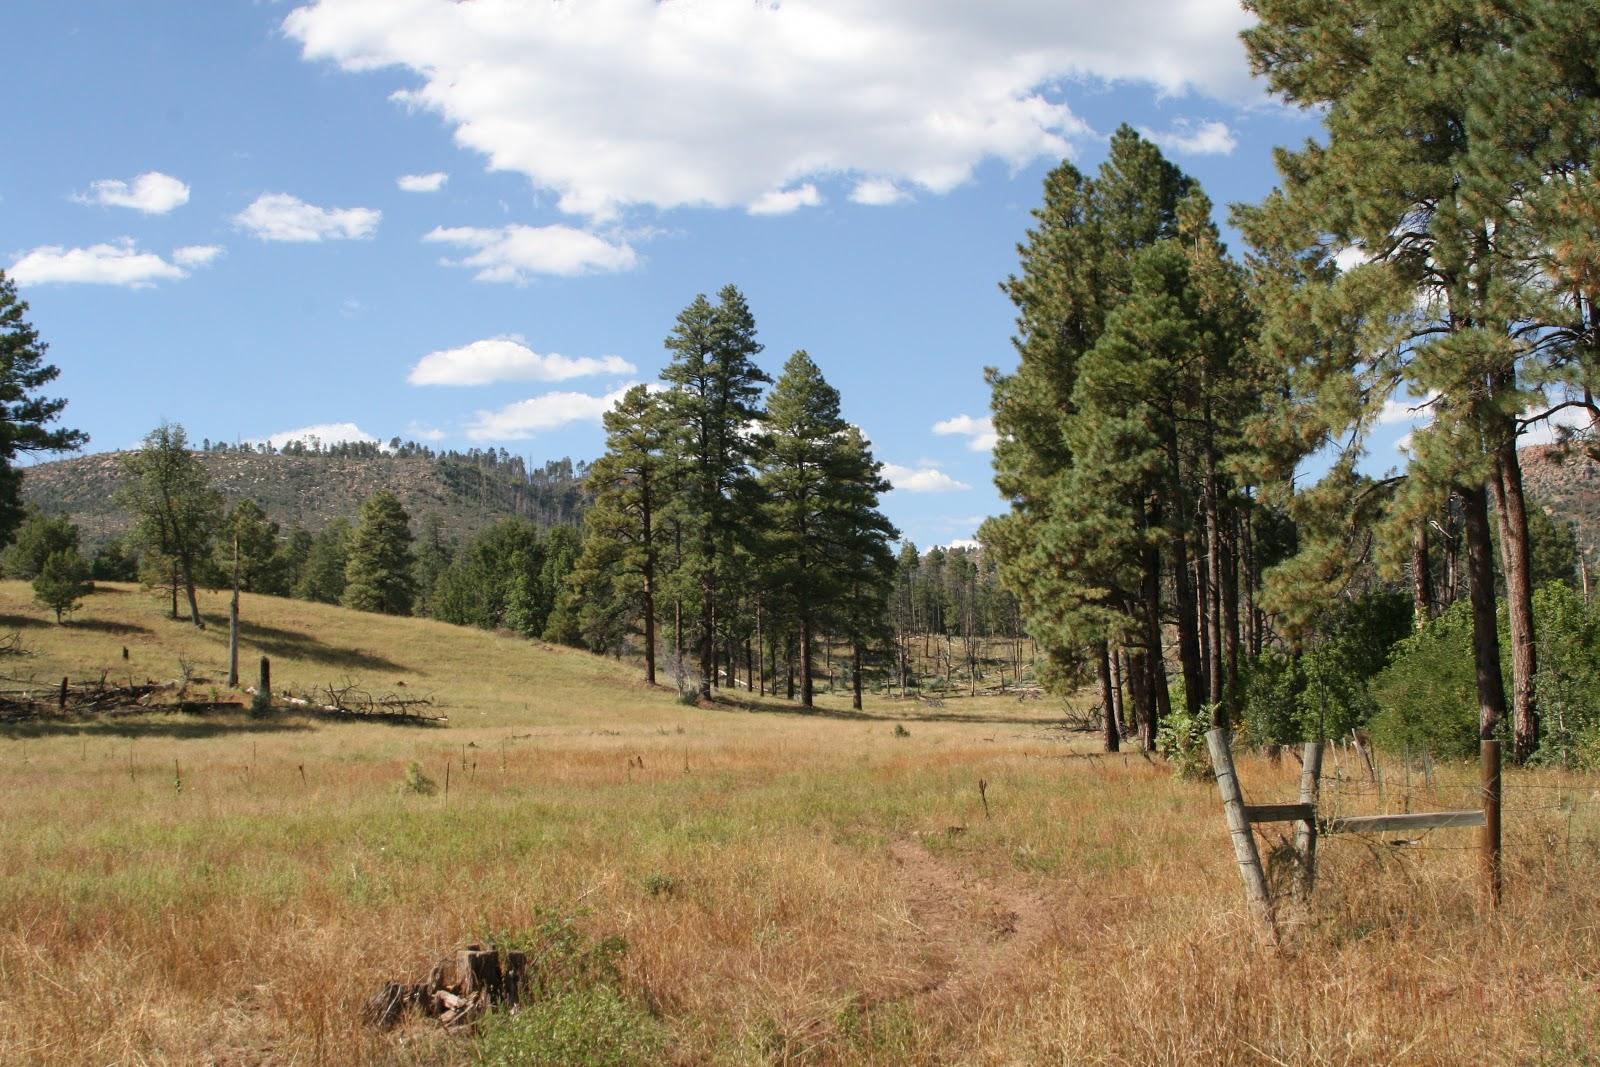 Canyon creek hatchery arizona autos weblog for Wooden nickel cabins